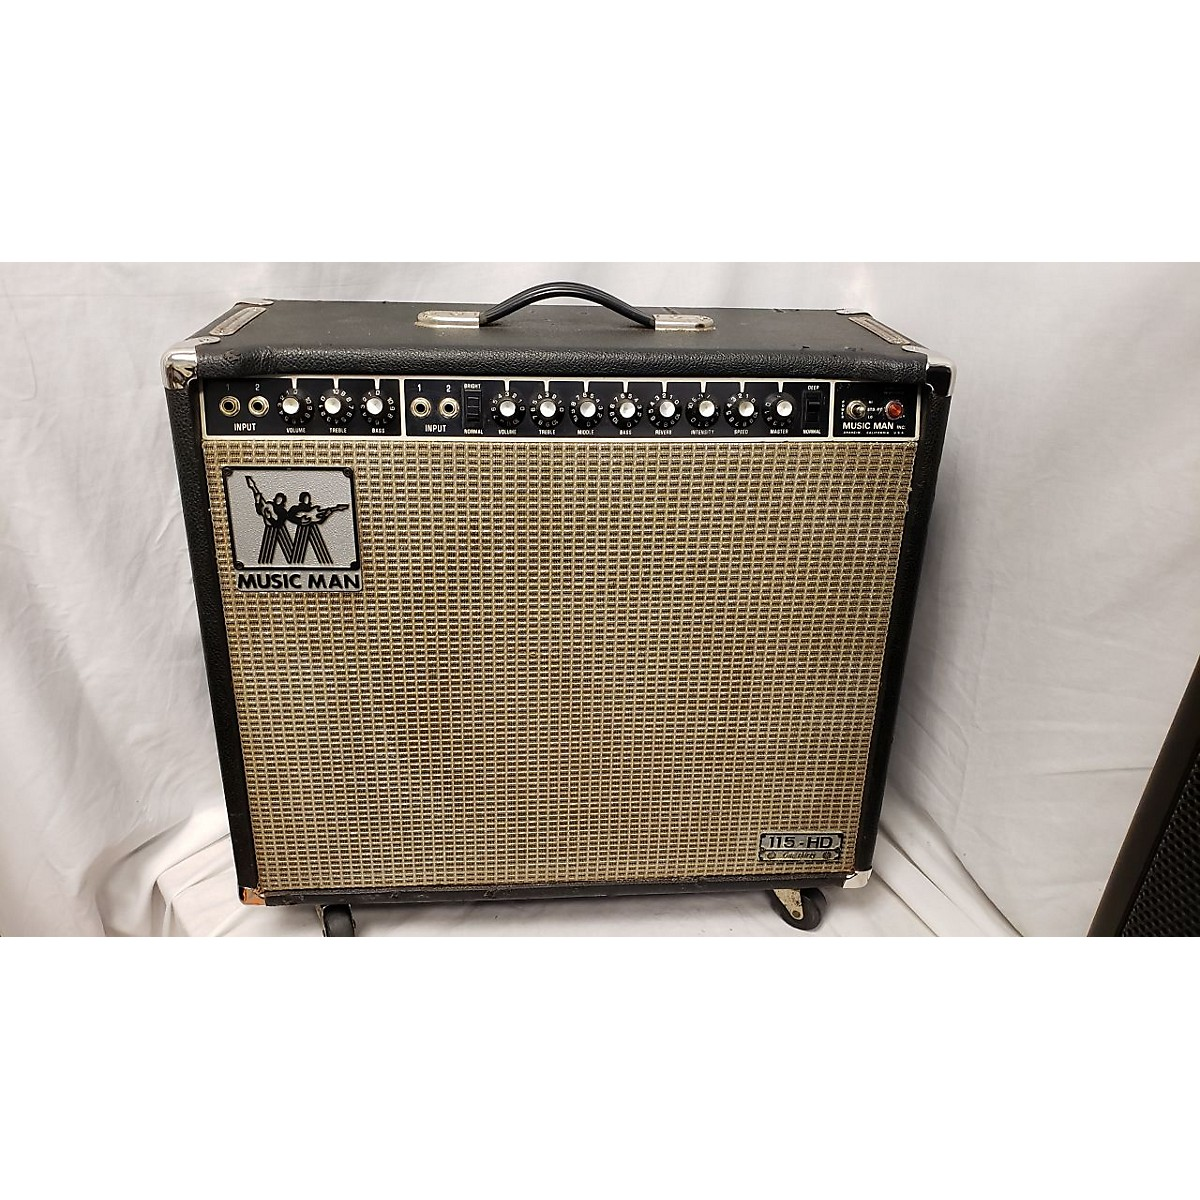 Ernie Ball Music Man 1970s 115HD-130EV Tube Guitar Combo Amp